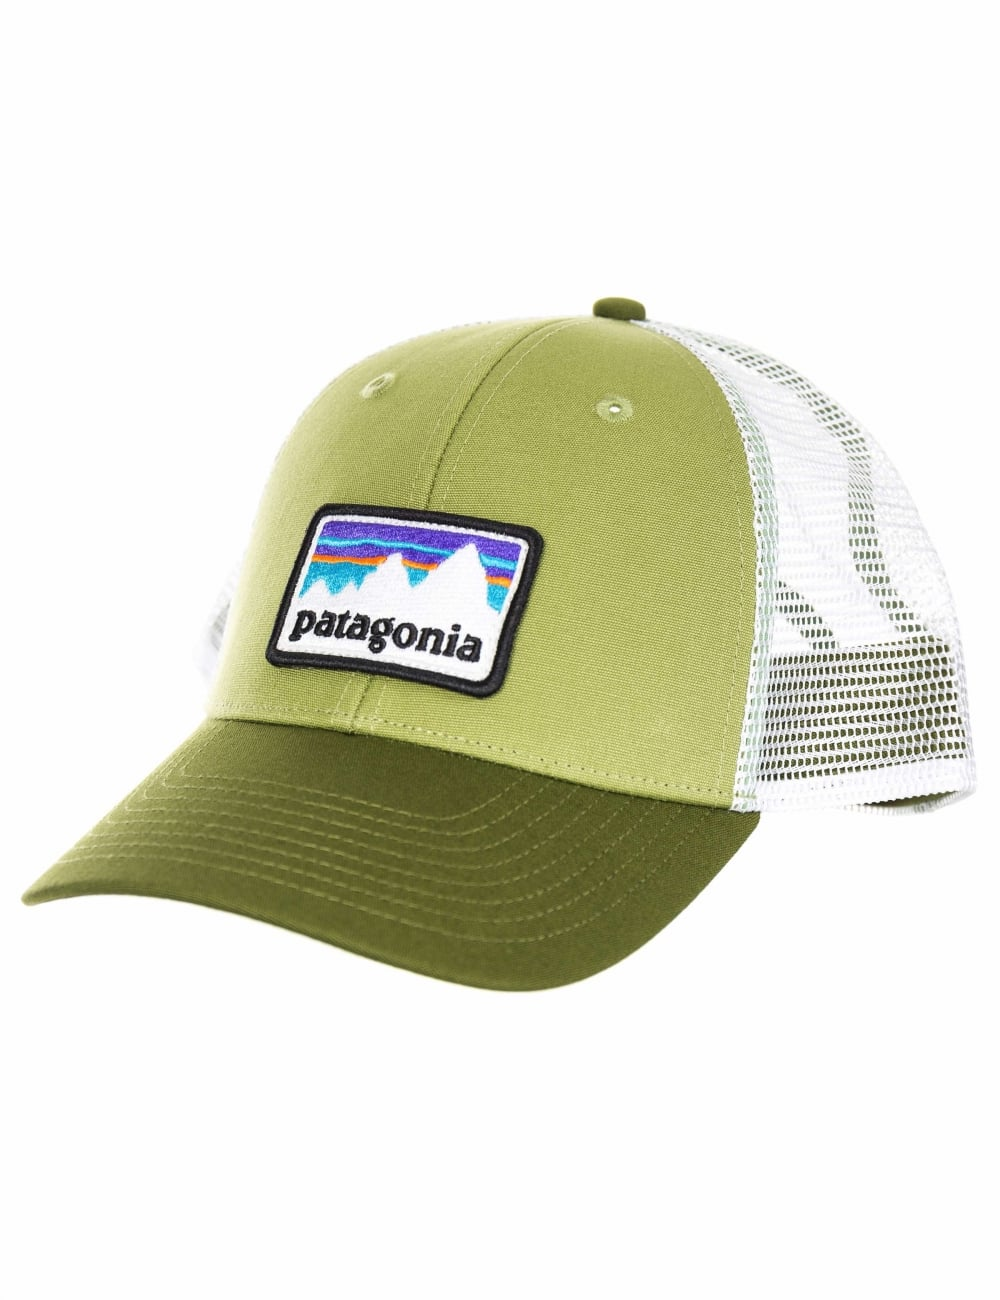 Patagonia Shop Sticker Patch LoPro Trucker Hat - Crag Green - Hat ... f9a15cae174